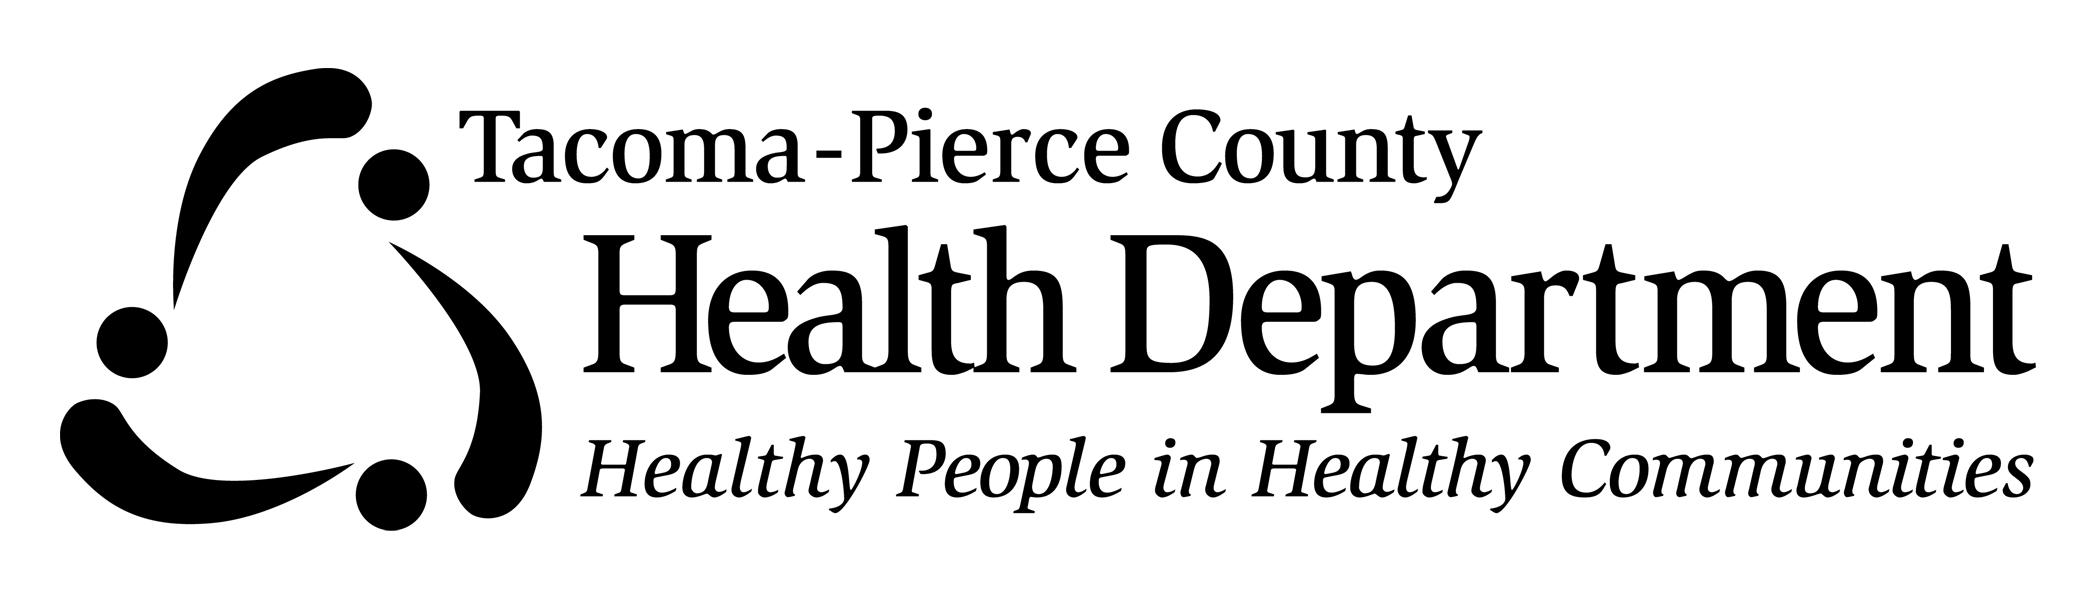 Tacoma-Pierce County Health Department